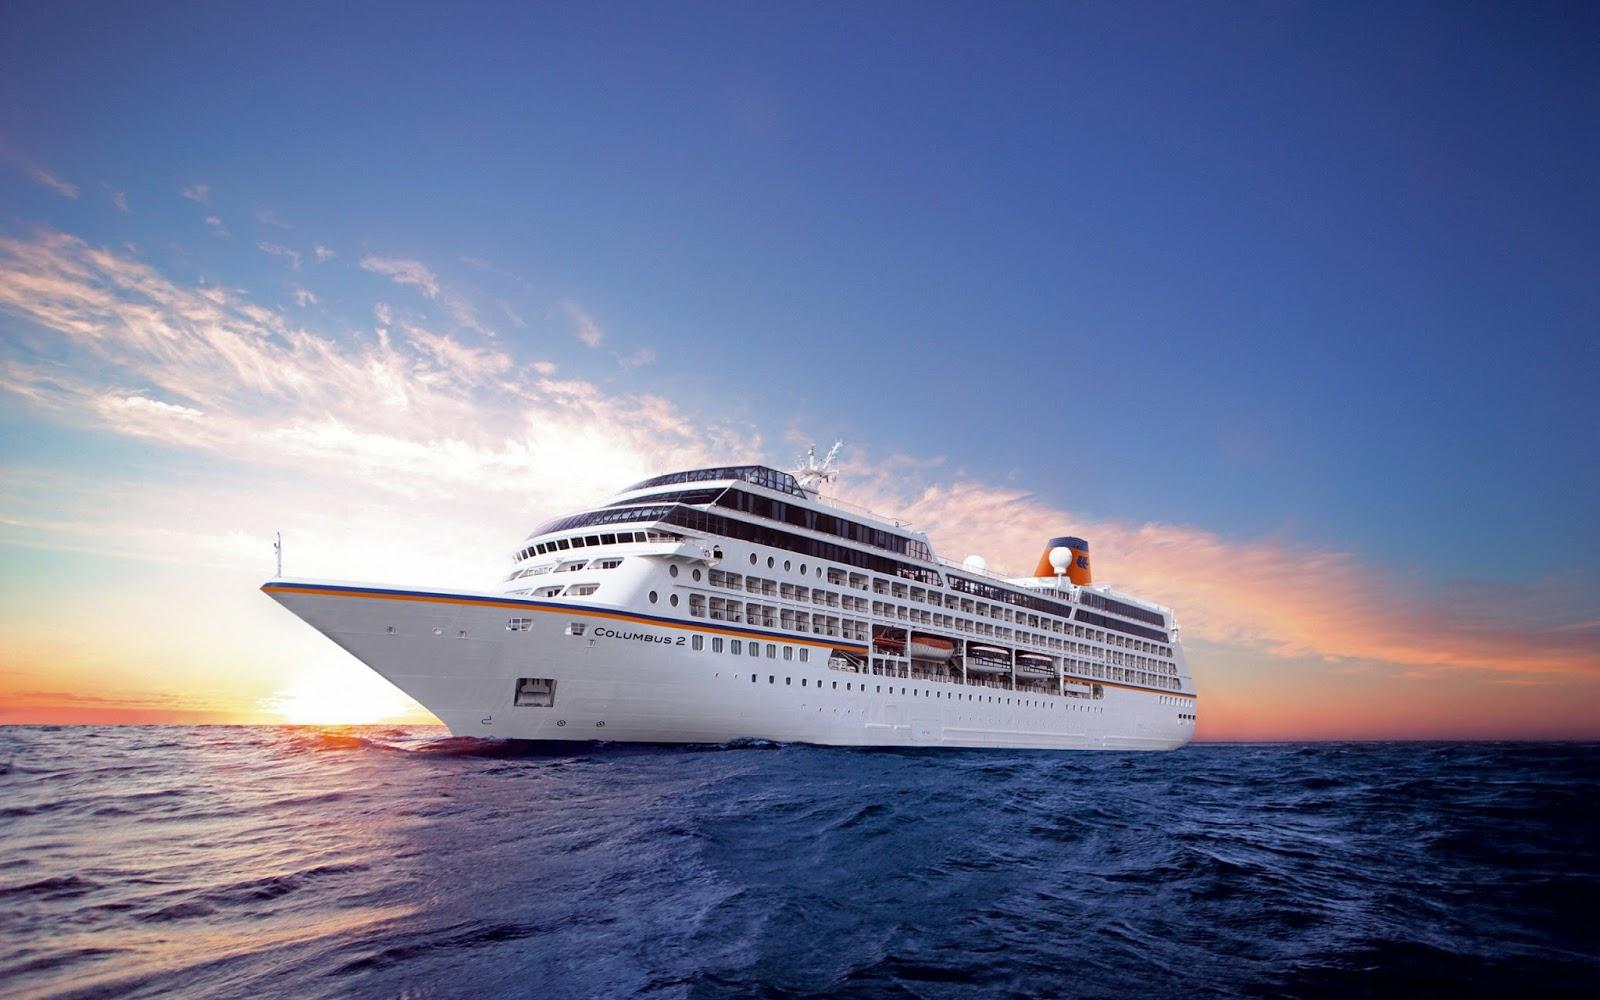 Cruise Ship Widescreen HD Desktop Backgrounds Photos Wallpapers 1600x1000